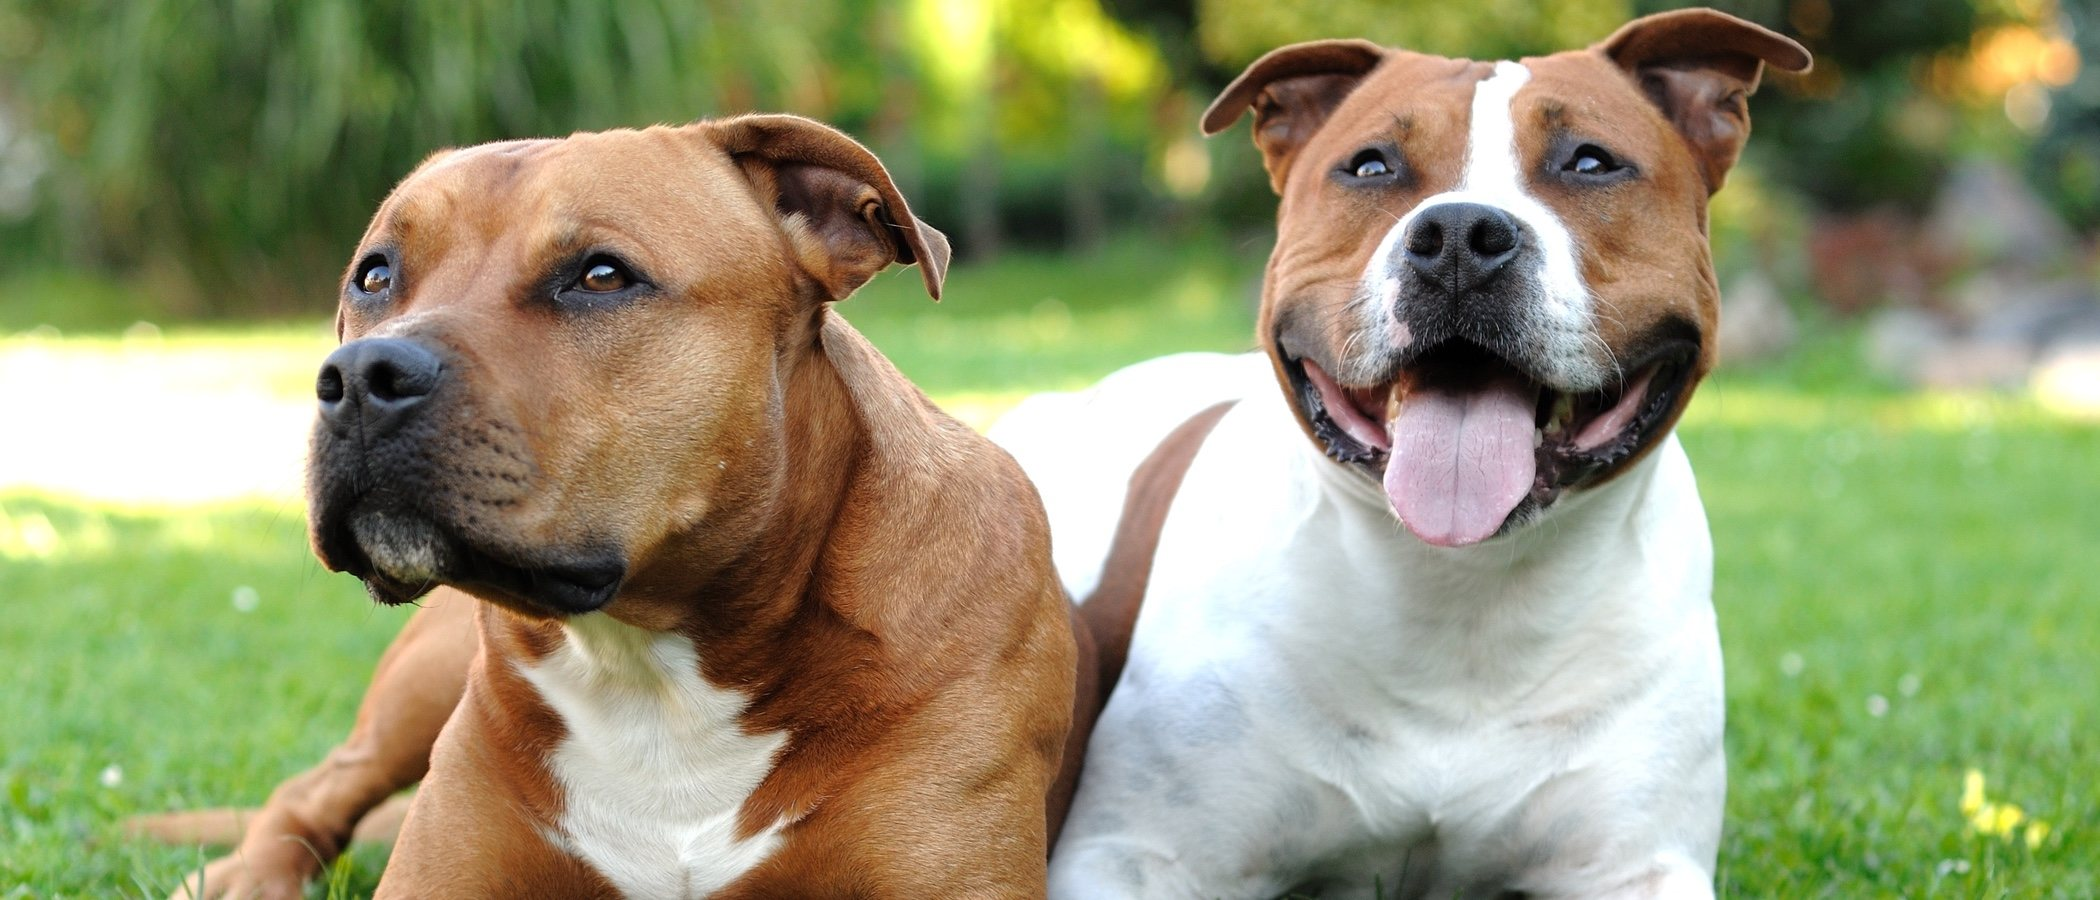 Normativa sobre perros peligrosos en España: aspectos relevantes